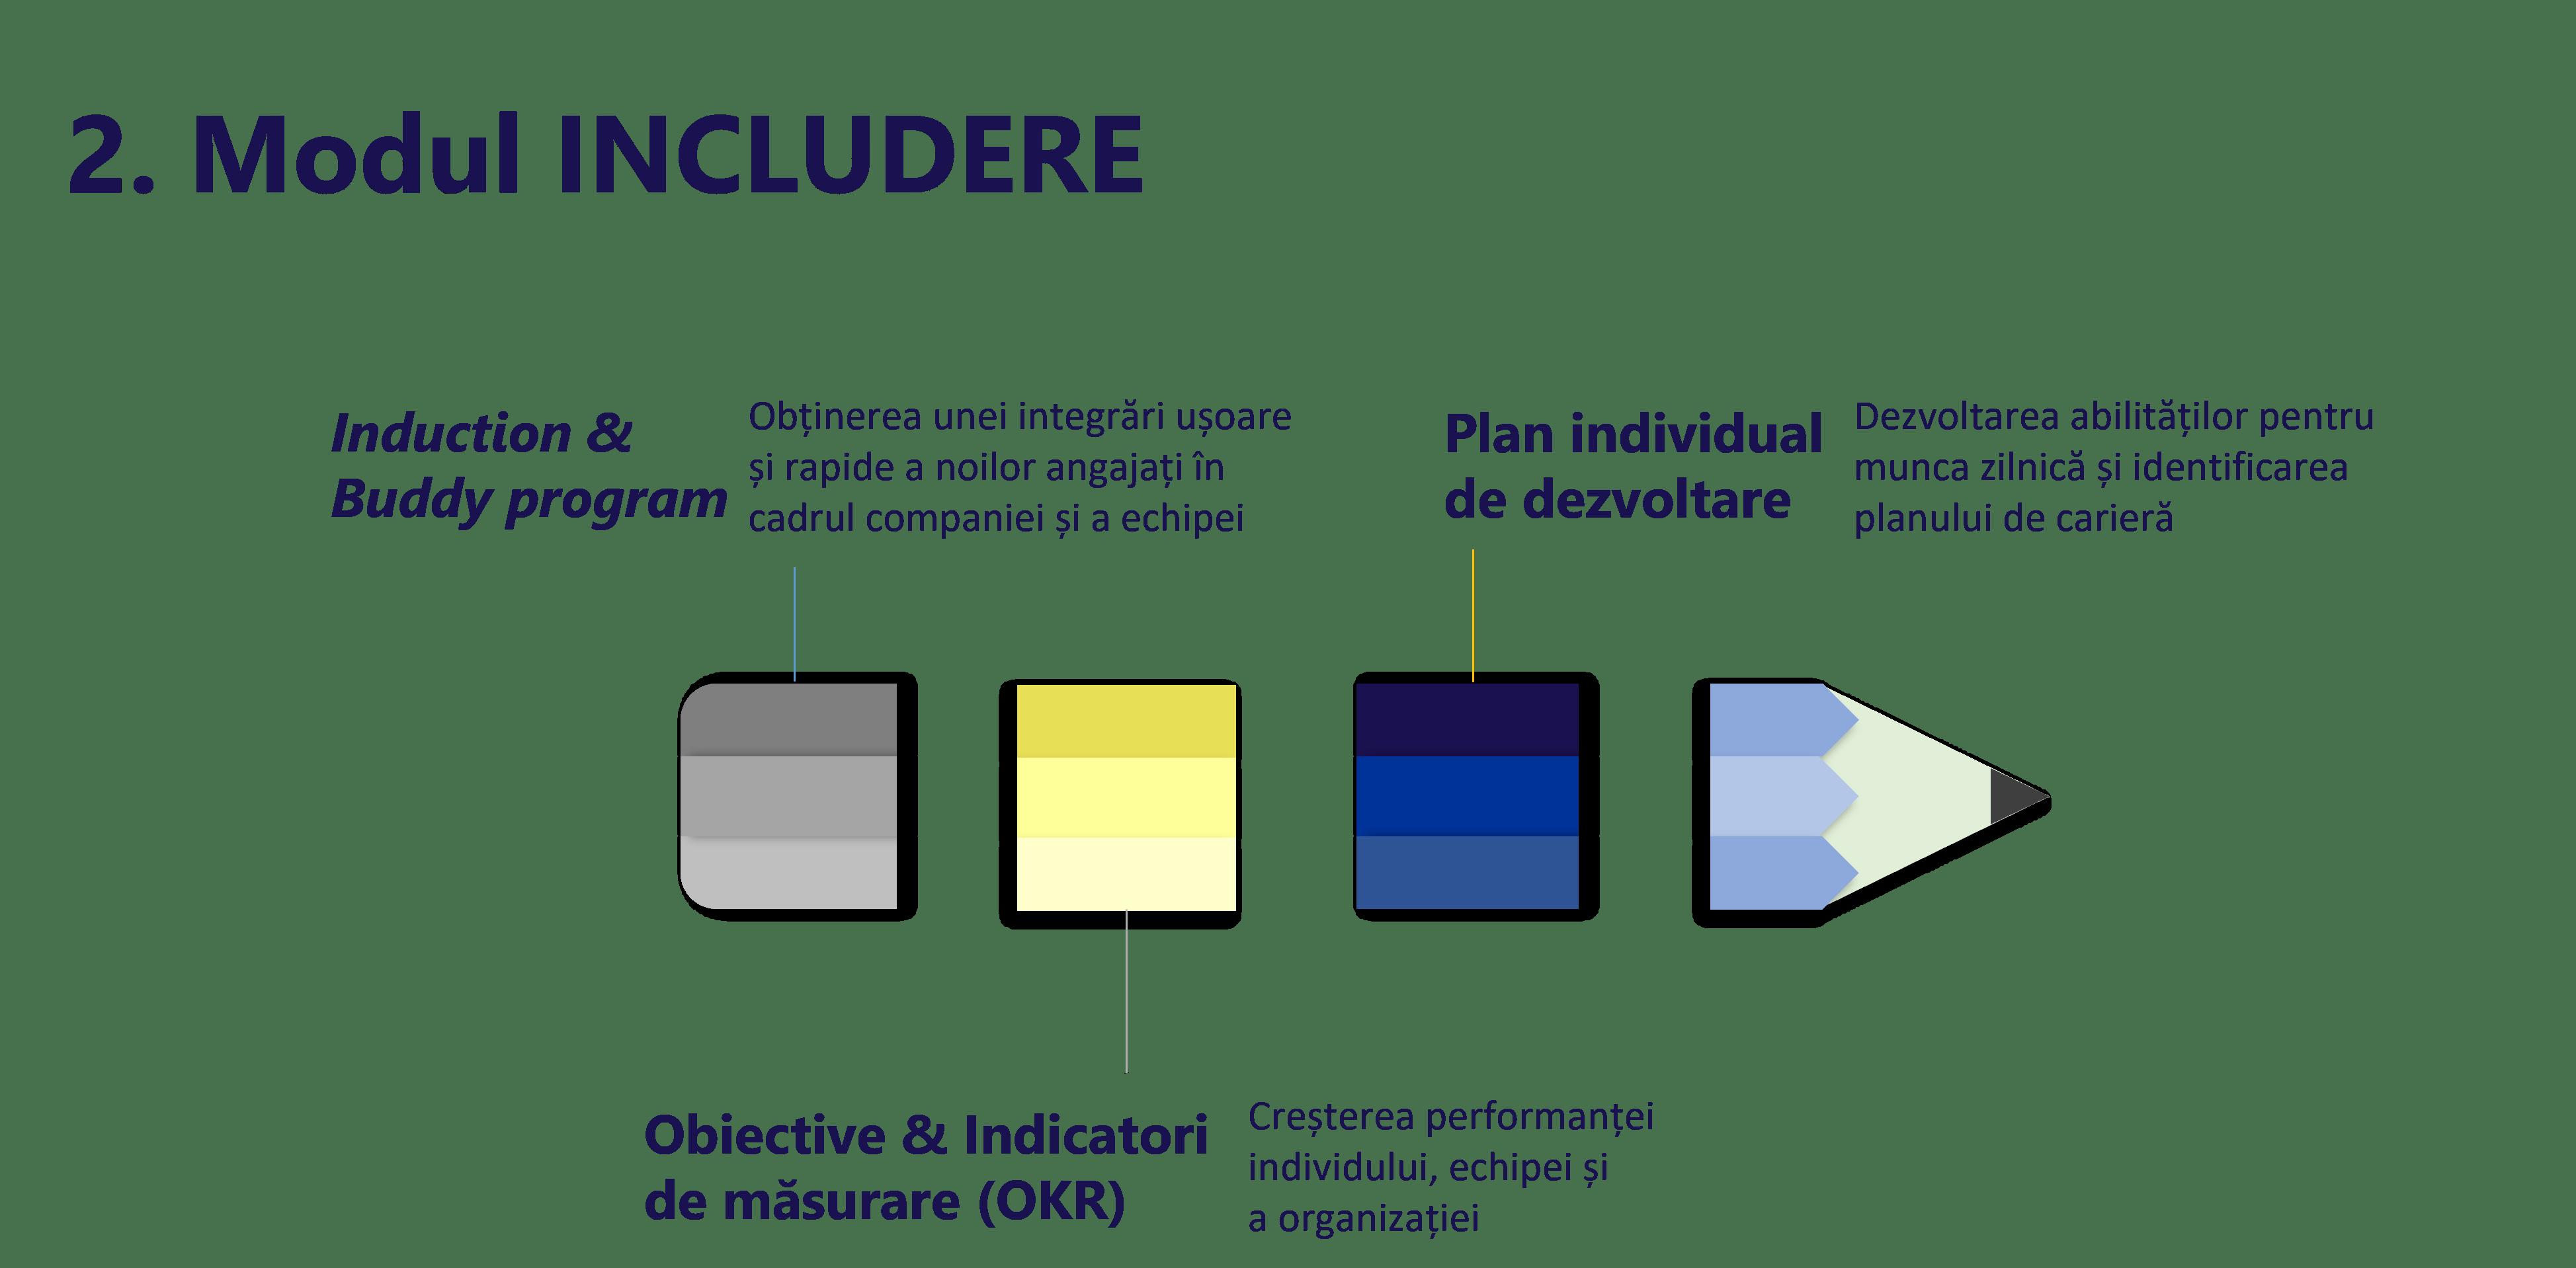 HR Design-modul 2-Includere.png